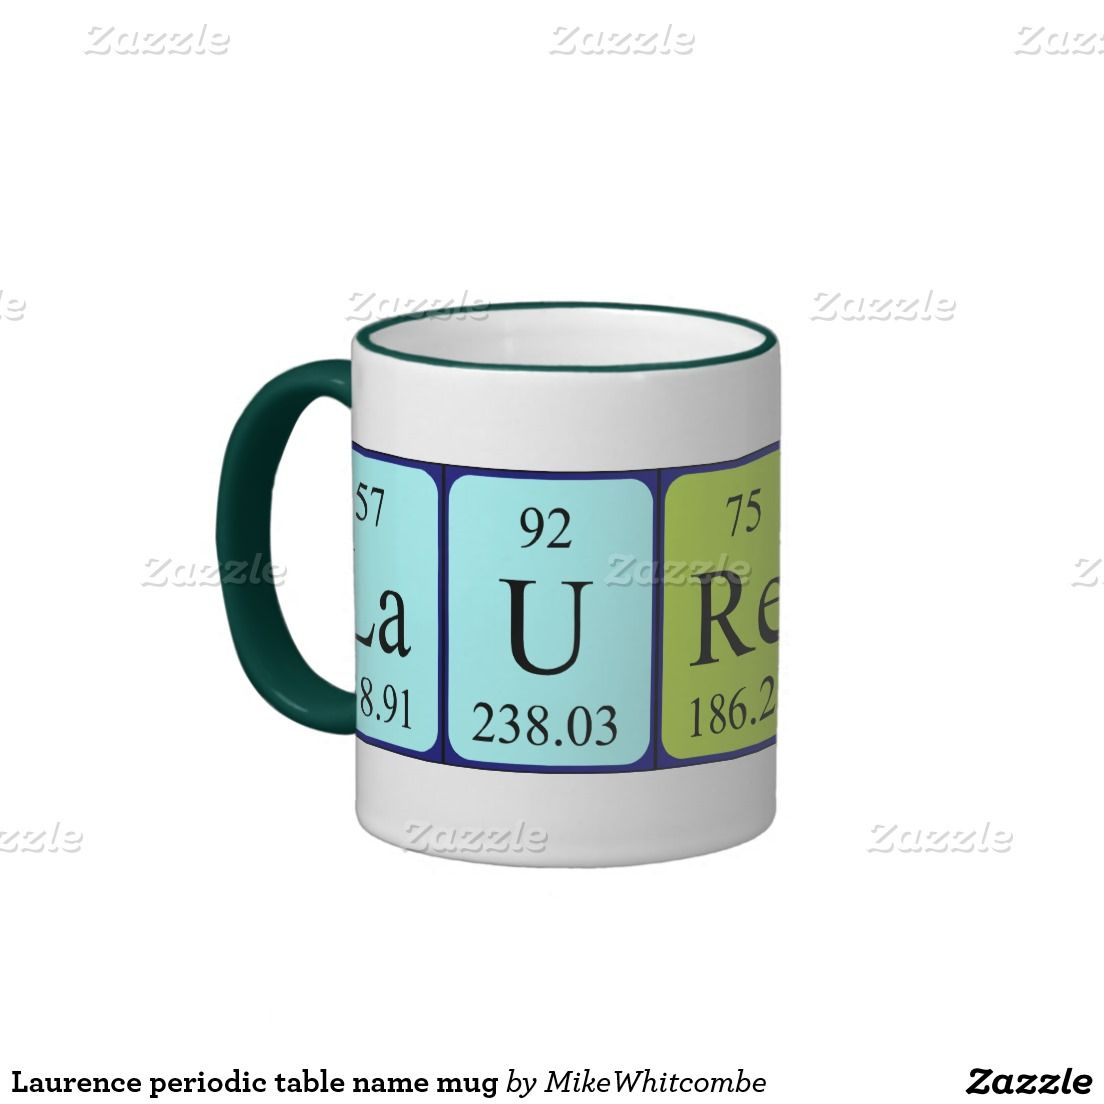 Laurence periodic table name mug tables table names and periodic laurence periodic table name mug urtaz Choice Image